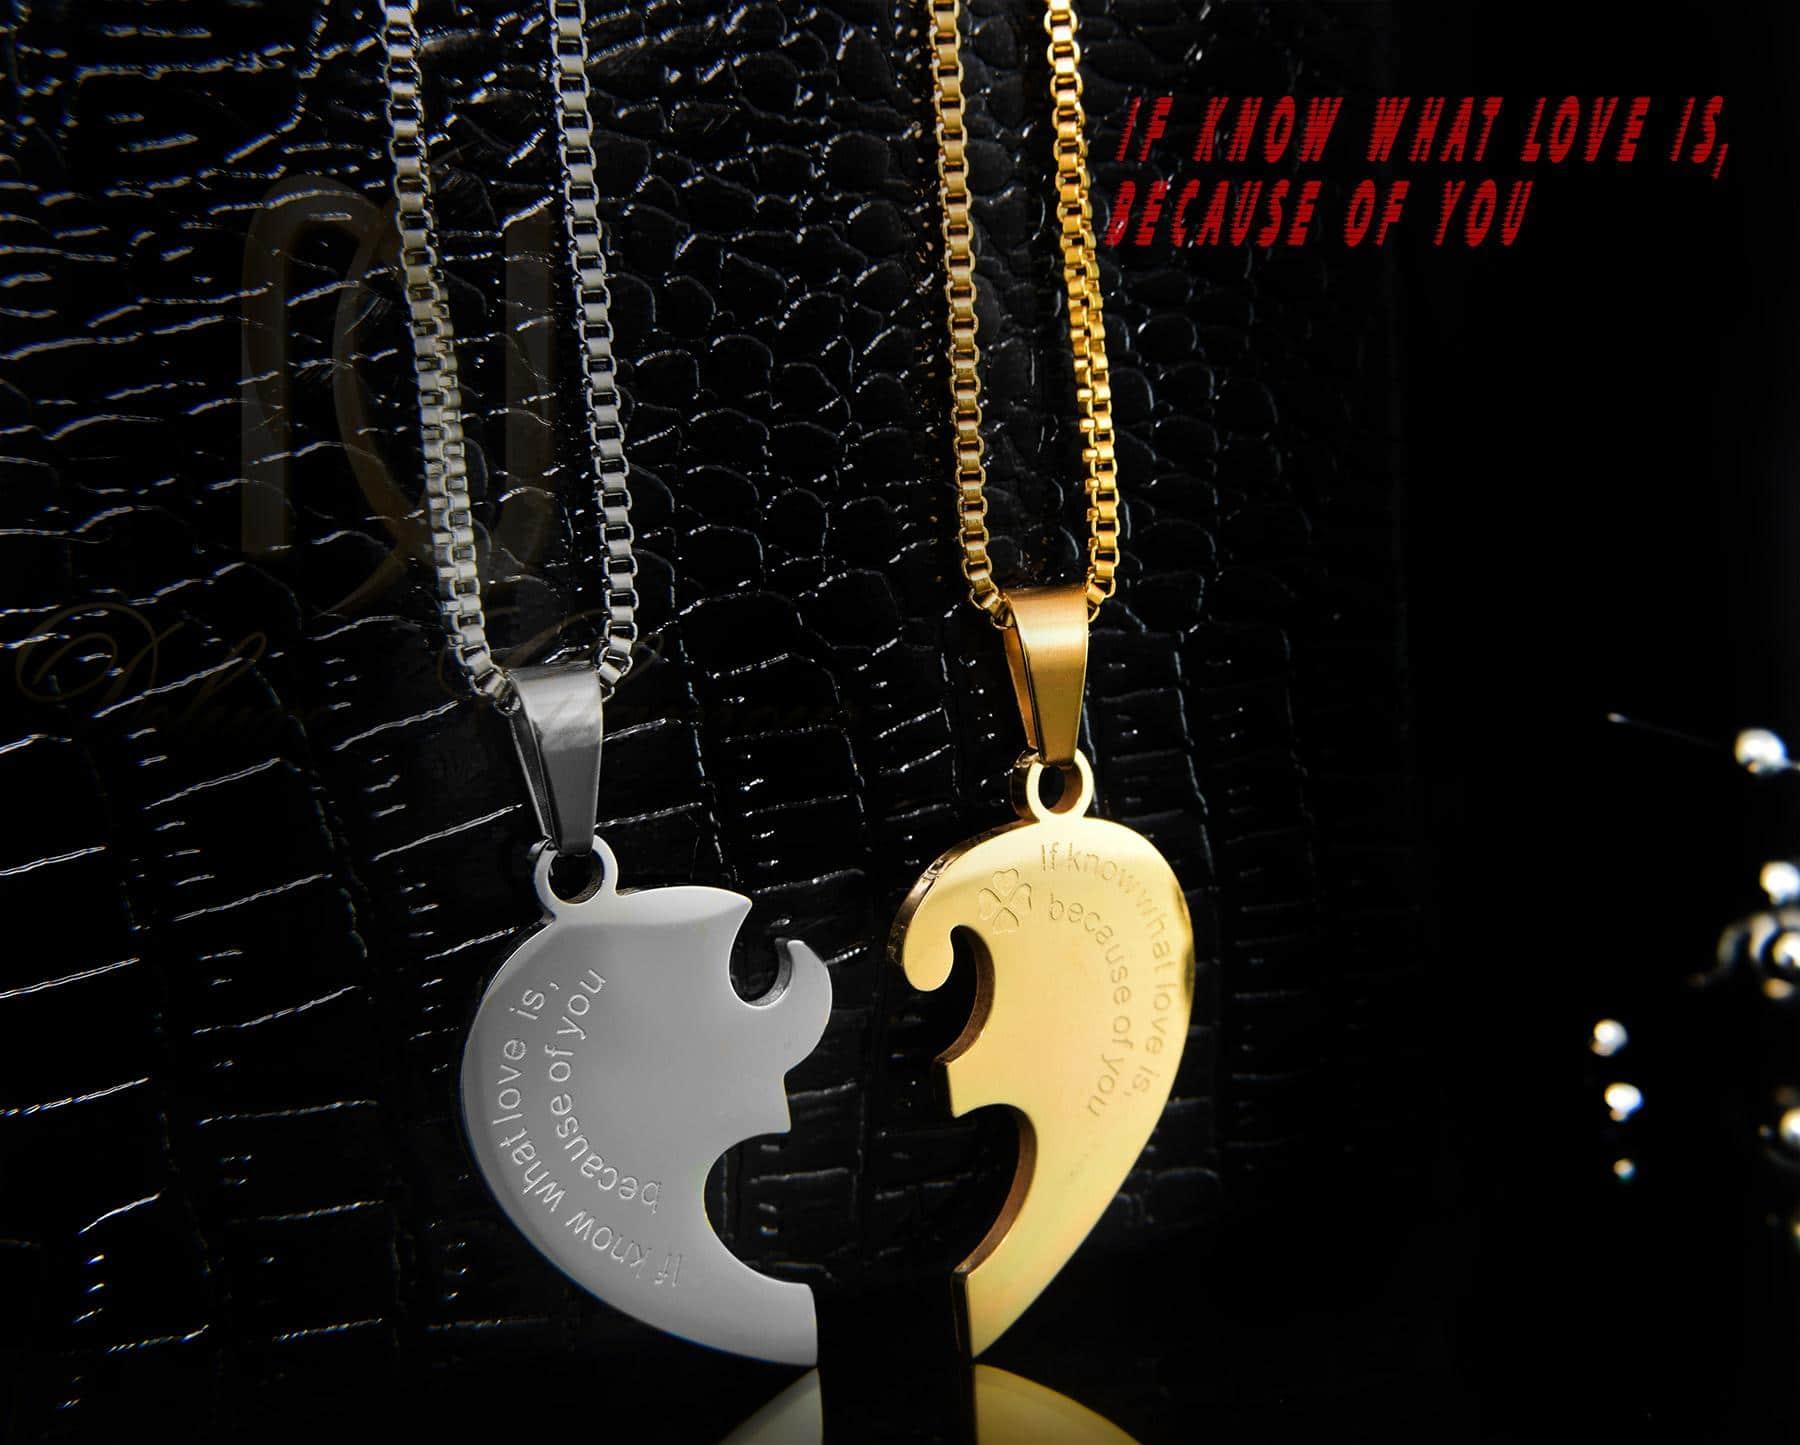 گردنبند ست عاشقانه طرح قلب  MF-N129